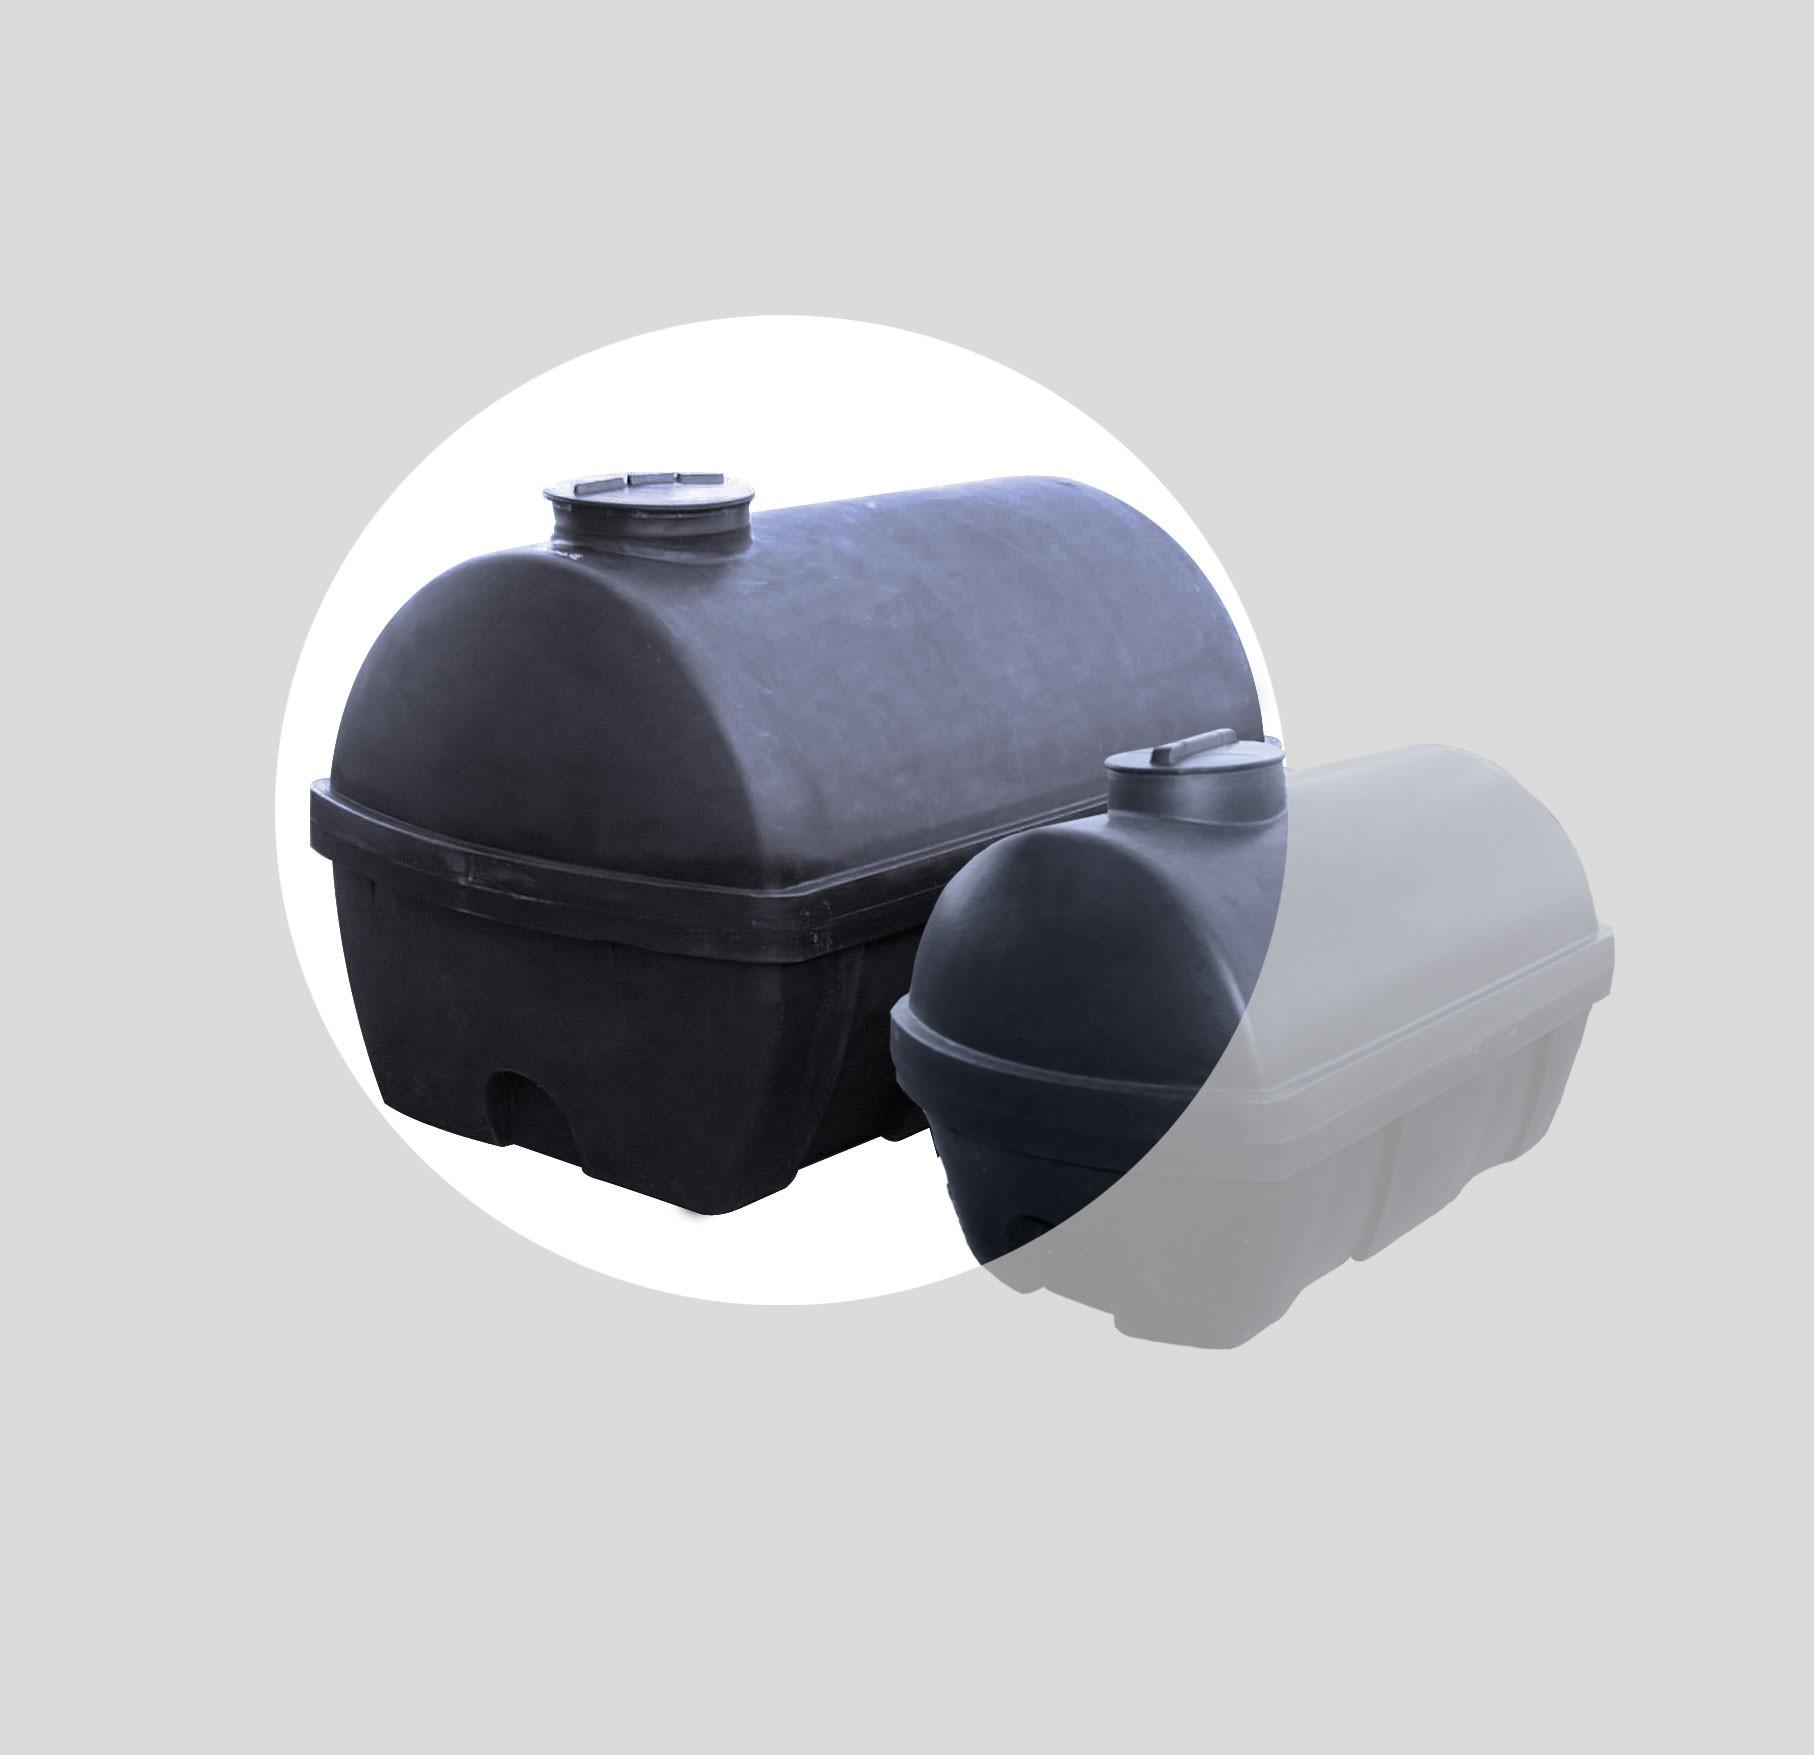 regenwasser sammeltank liegend 3000 l graf 327053 bei. Black Bedroom Furniture Sets. Home Design Ideas